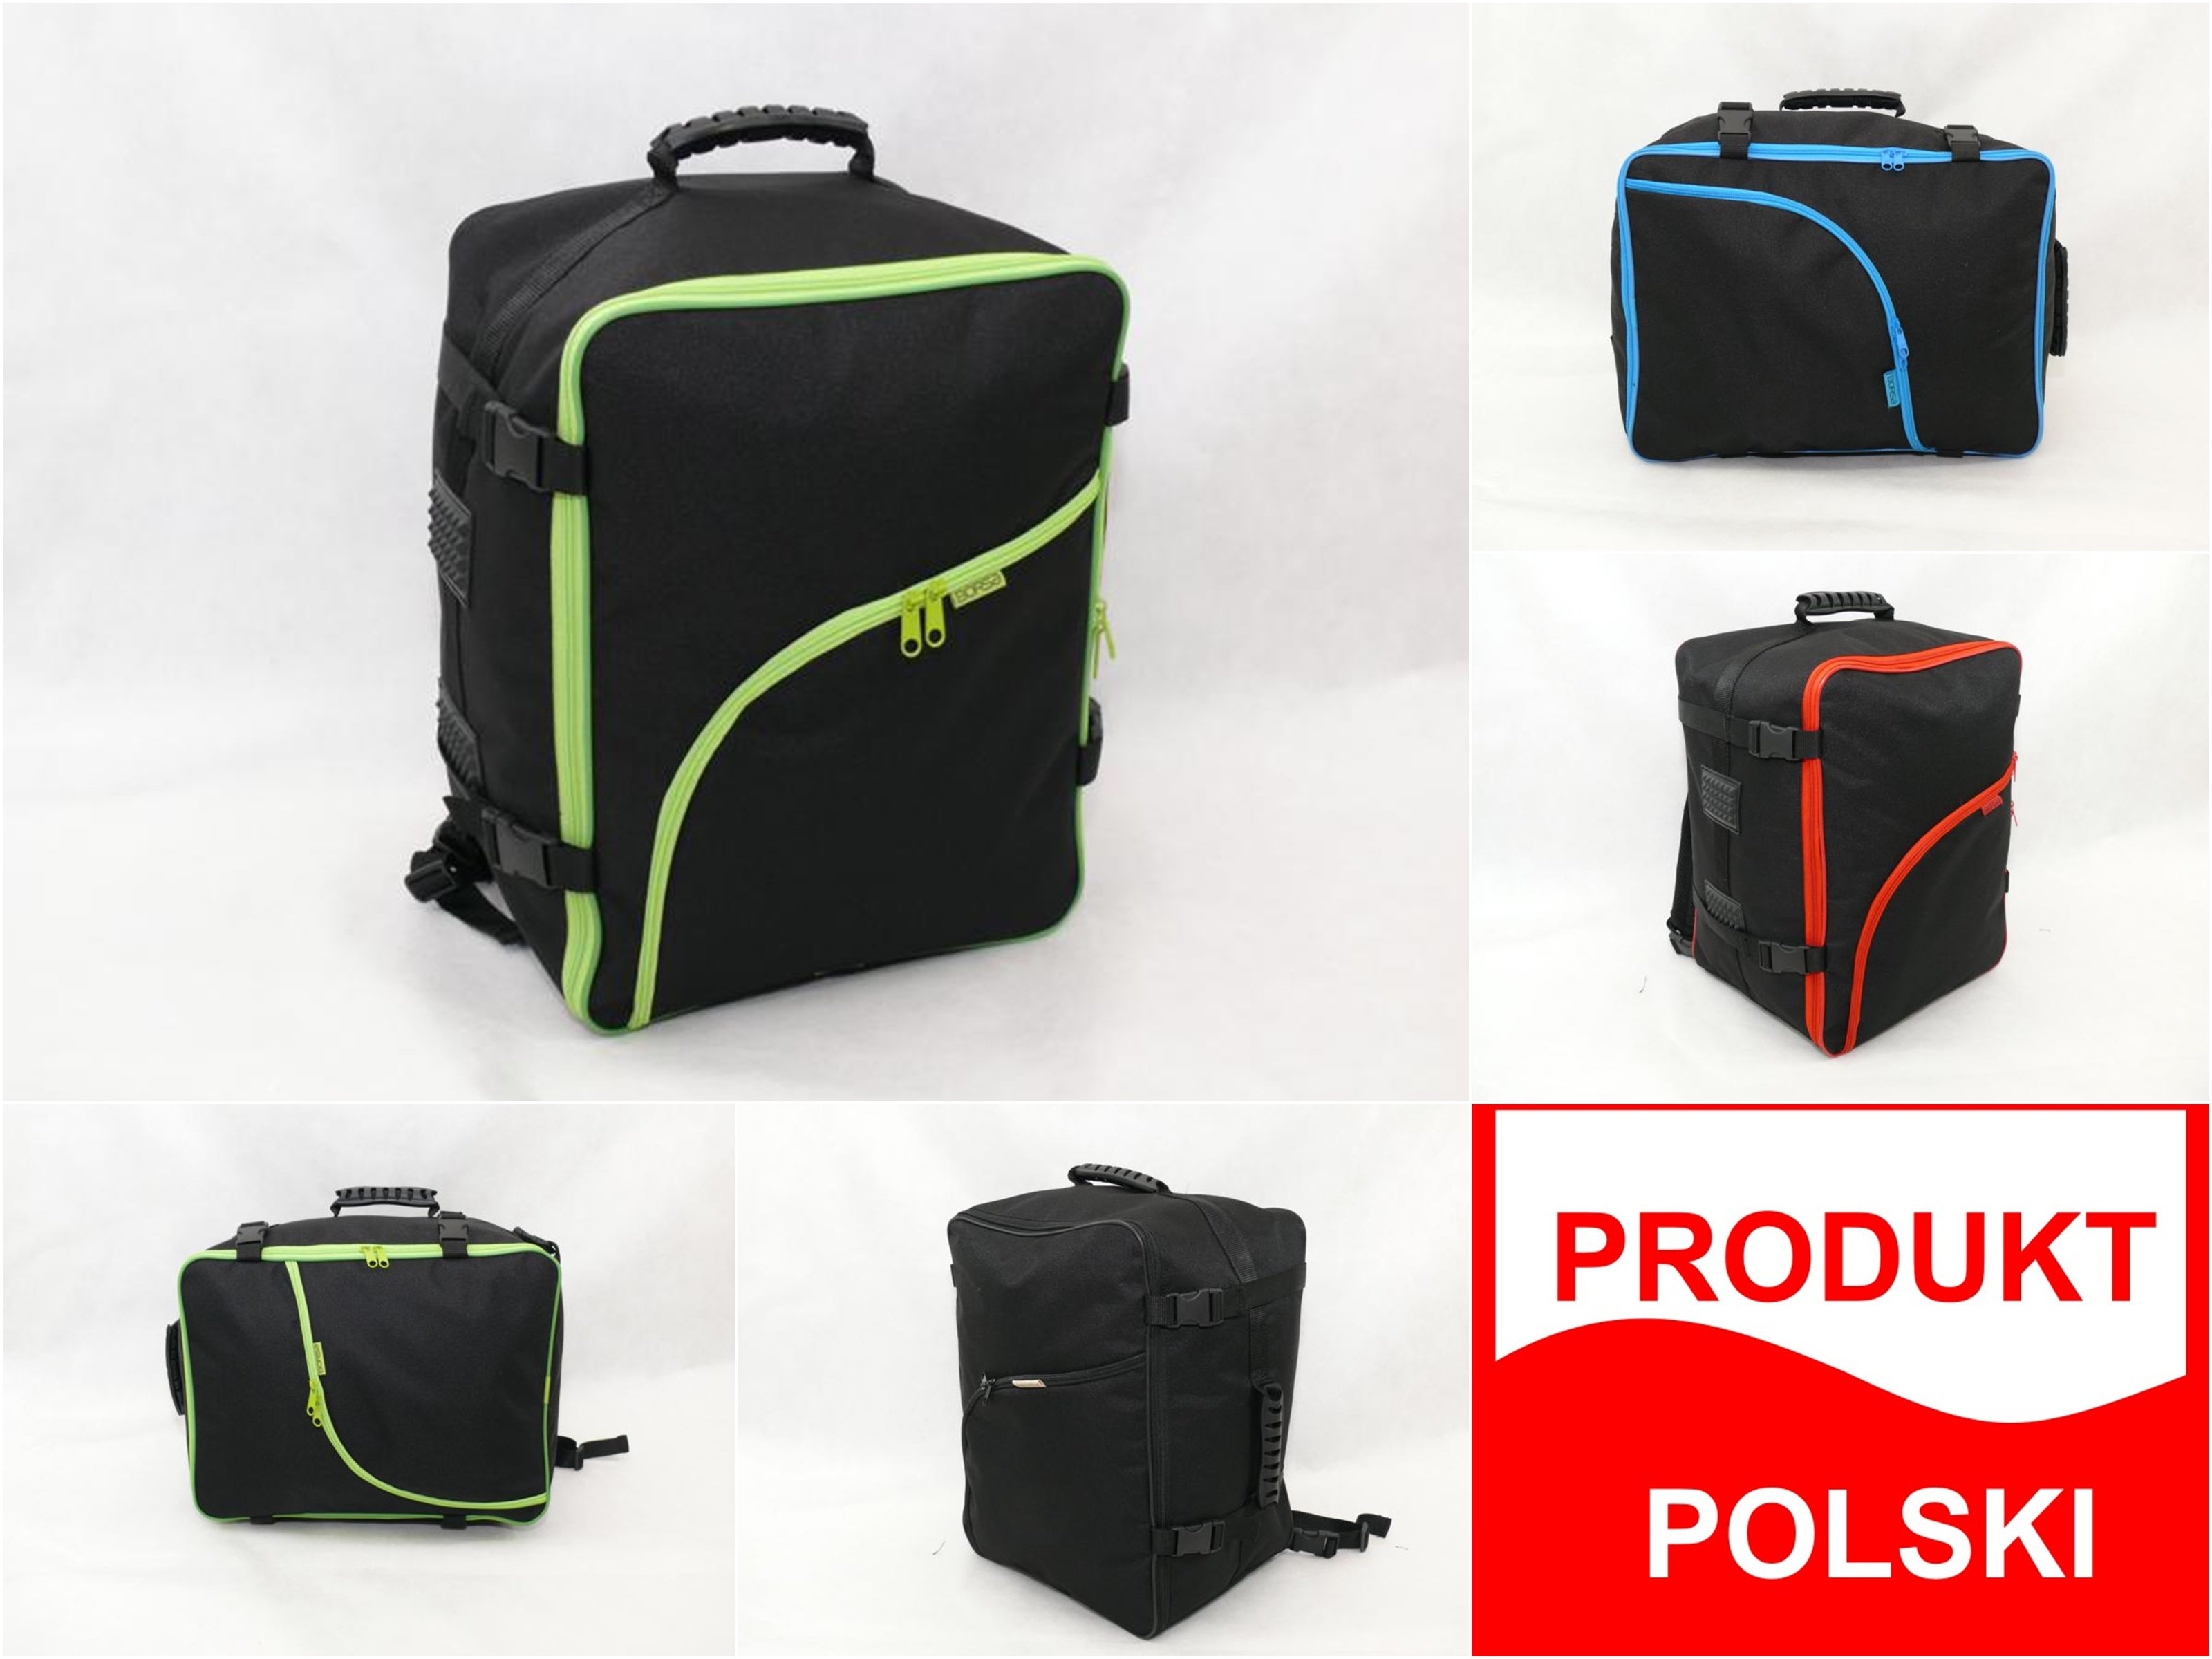 c0a8064e87d93 Plecak torba podróżna Ryanair TP-R-5